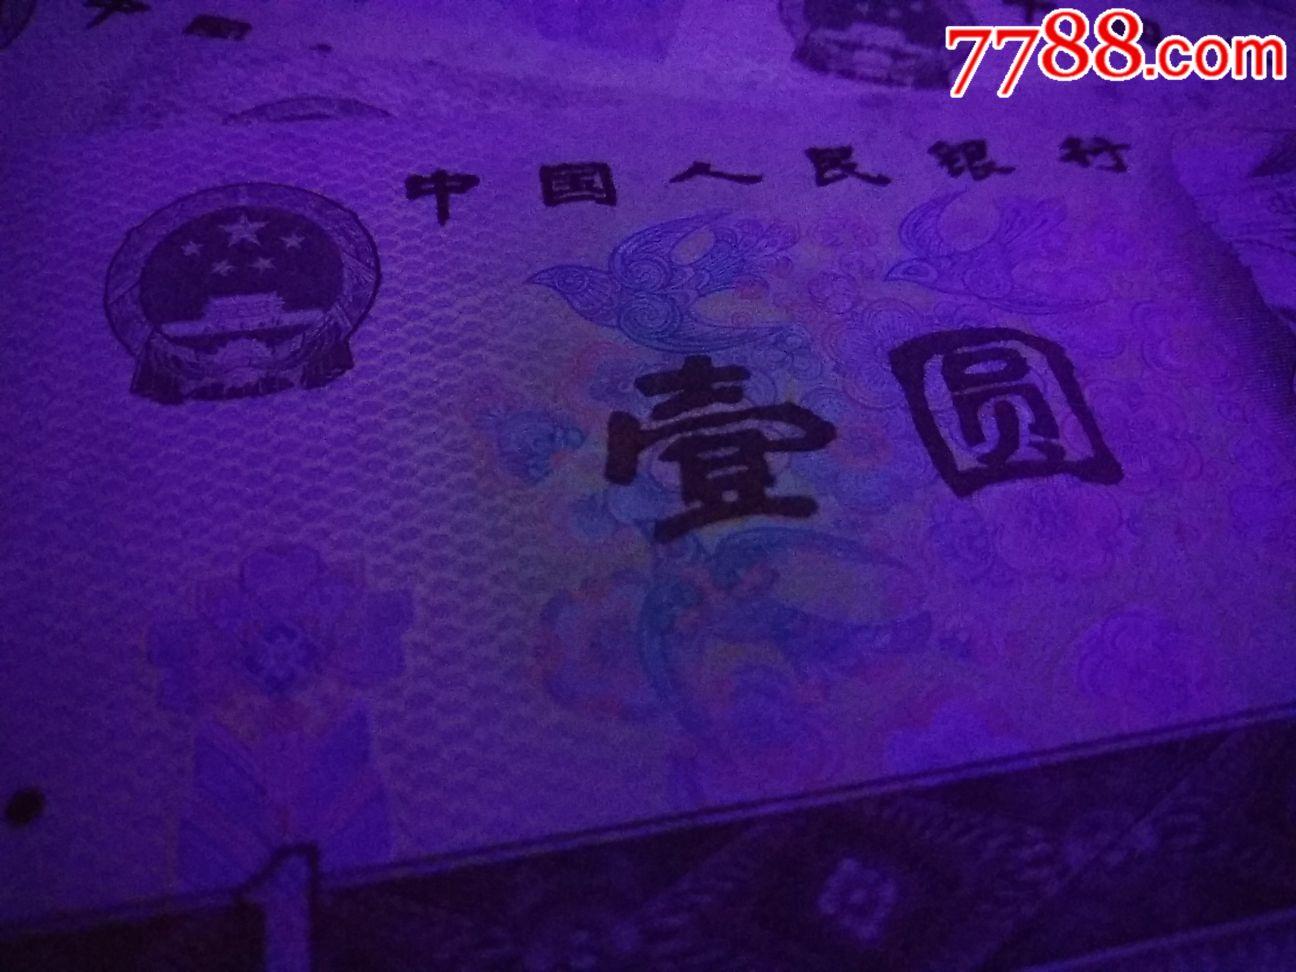 801金��王4��(au21489608)_